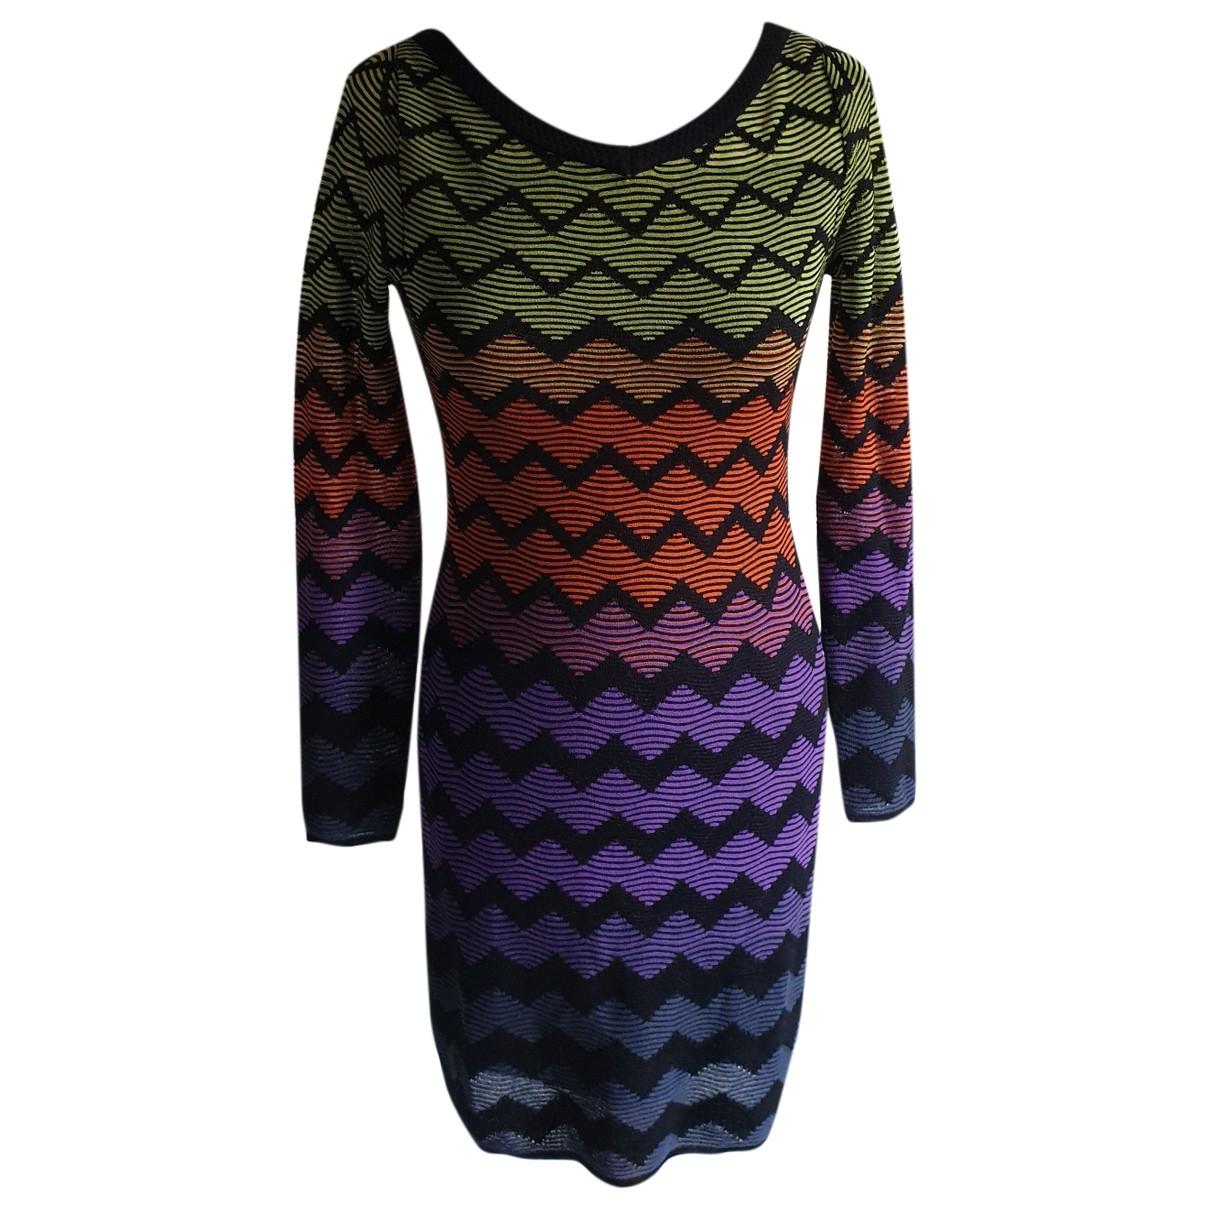 M Missoni \N Multicolour Cotton - elasthane dress for Women 38 IT